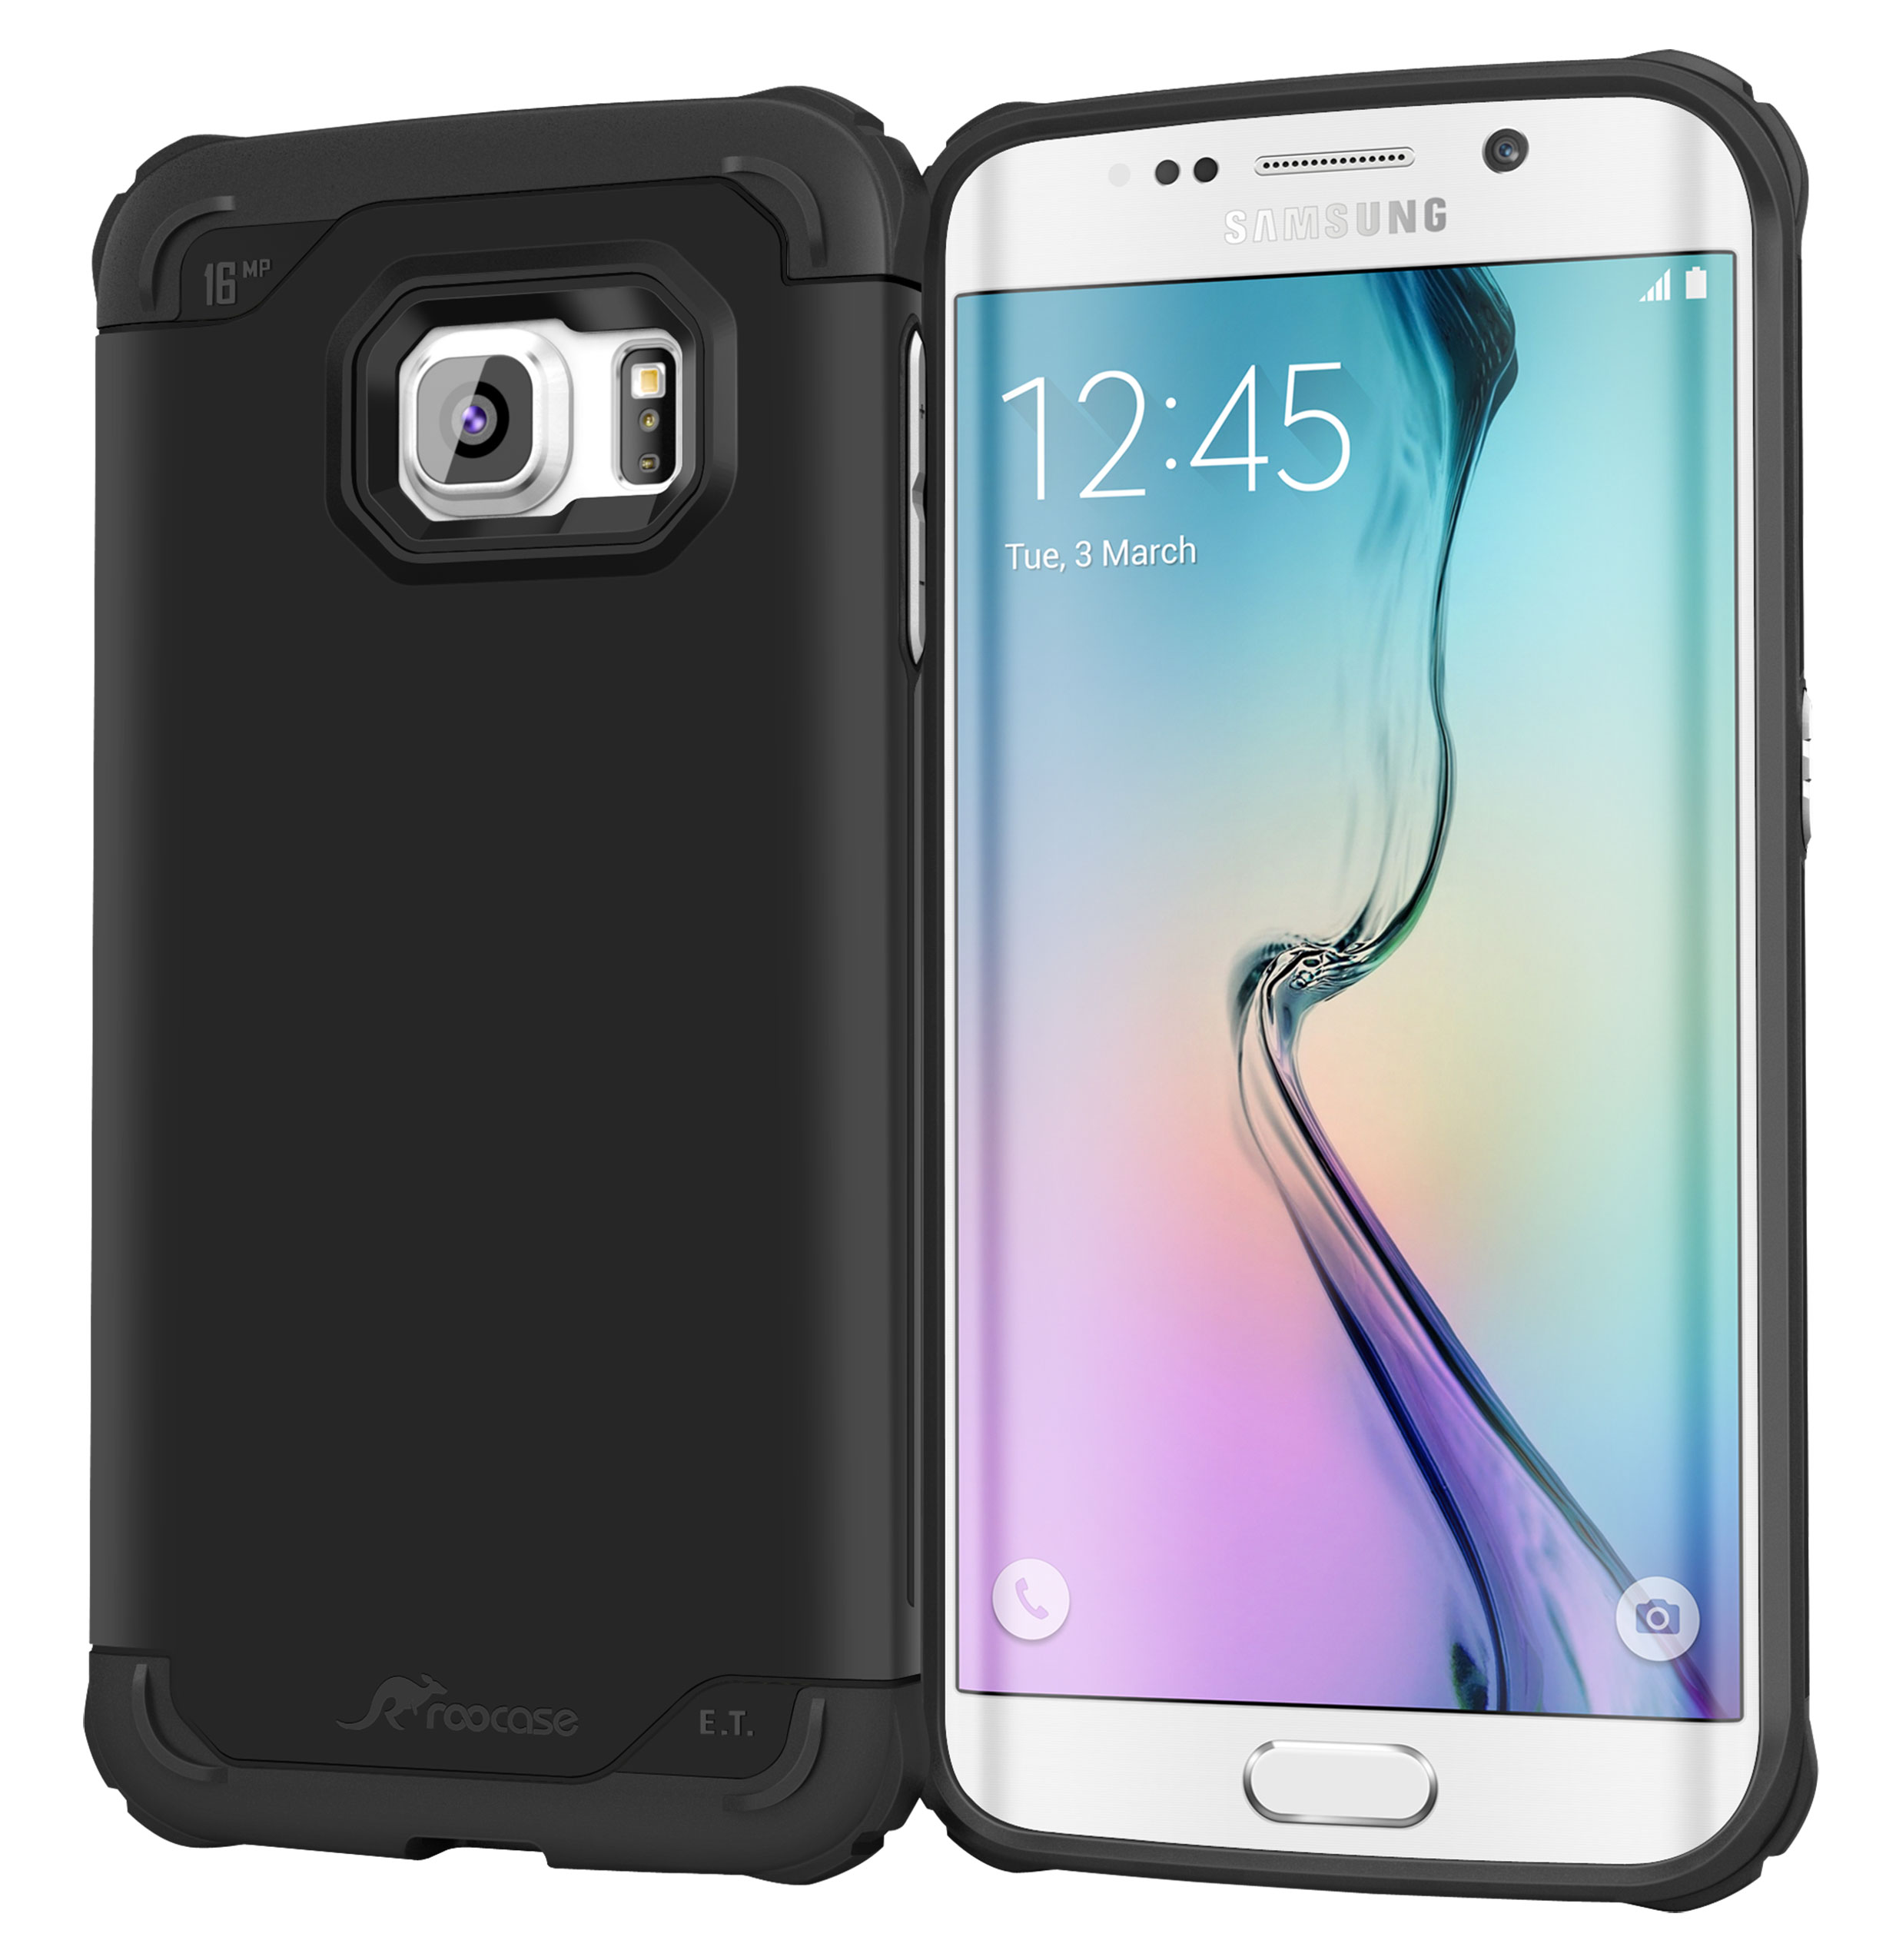 galaxy s6 casesgalaxy s6 edge case, roocase [exec tough] galaxy s6 edge slim fit case